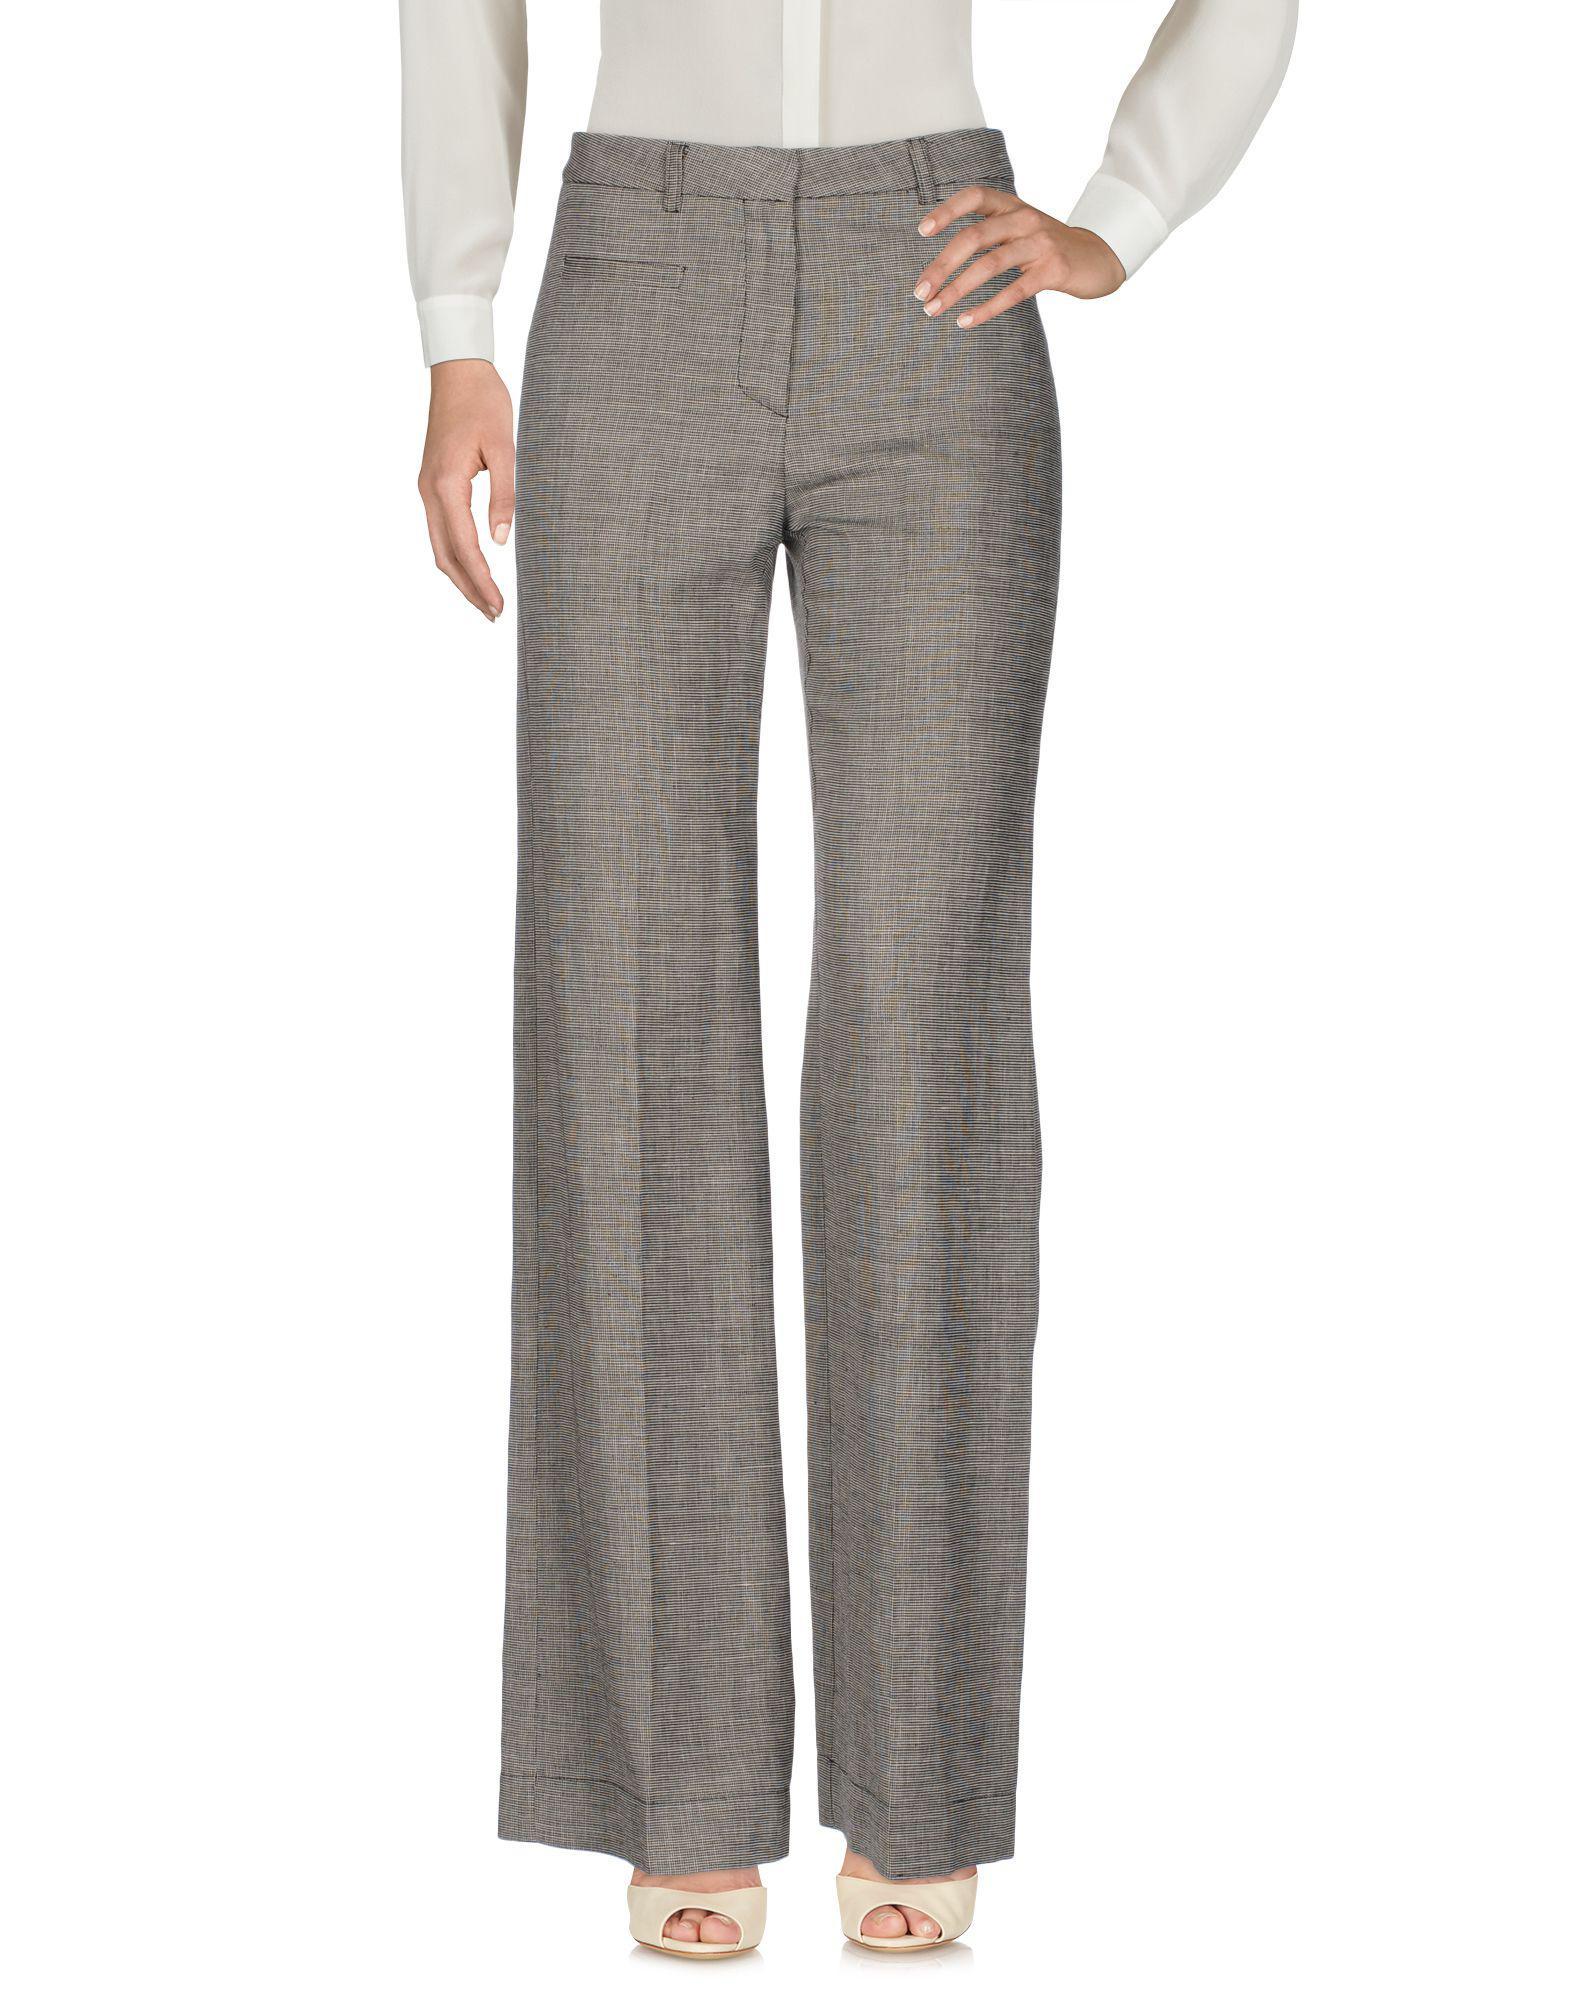 TROUSERS - Casual trousers Merci Popular Sale Online Release Dates Sale Online ZZFW4